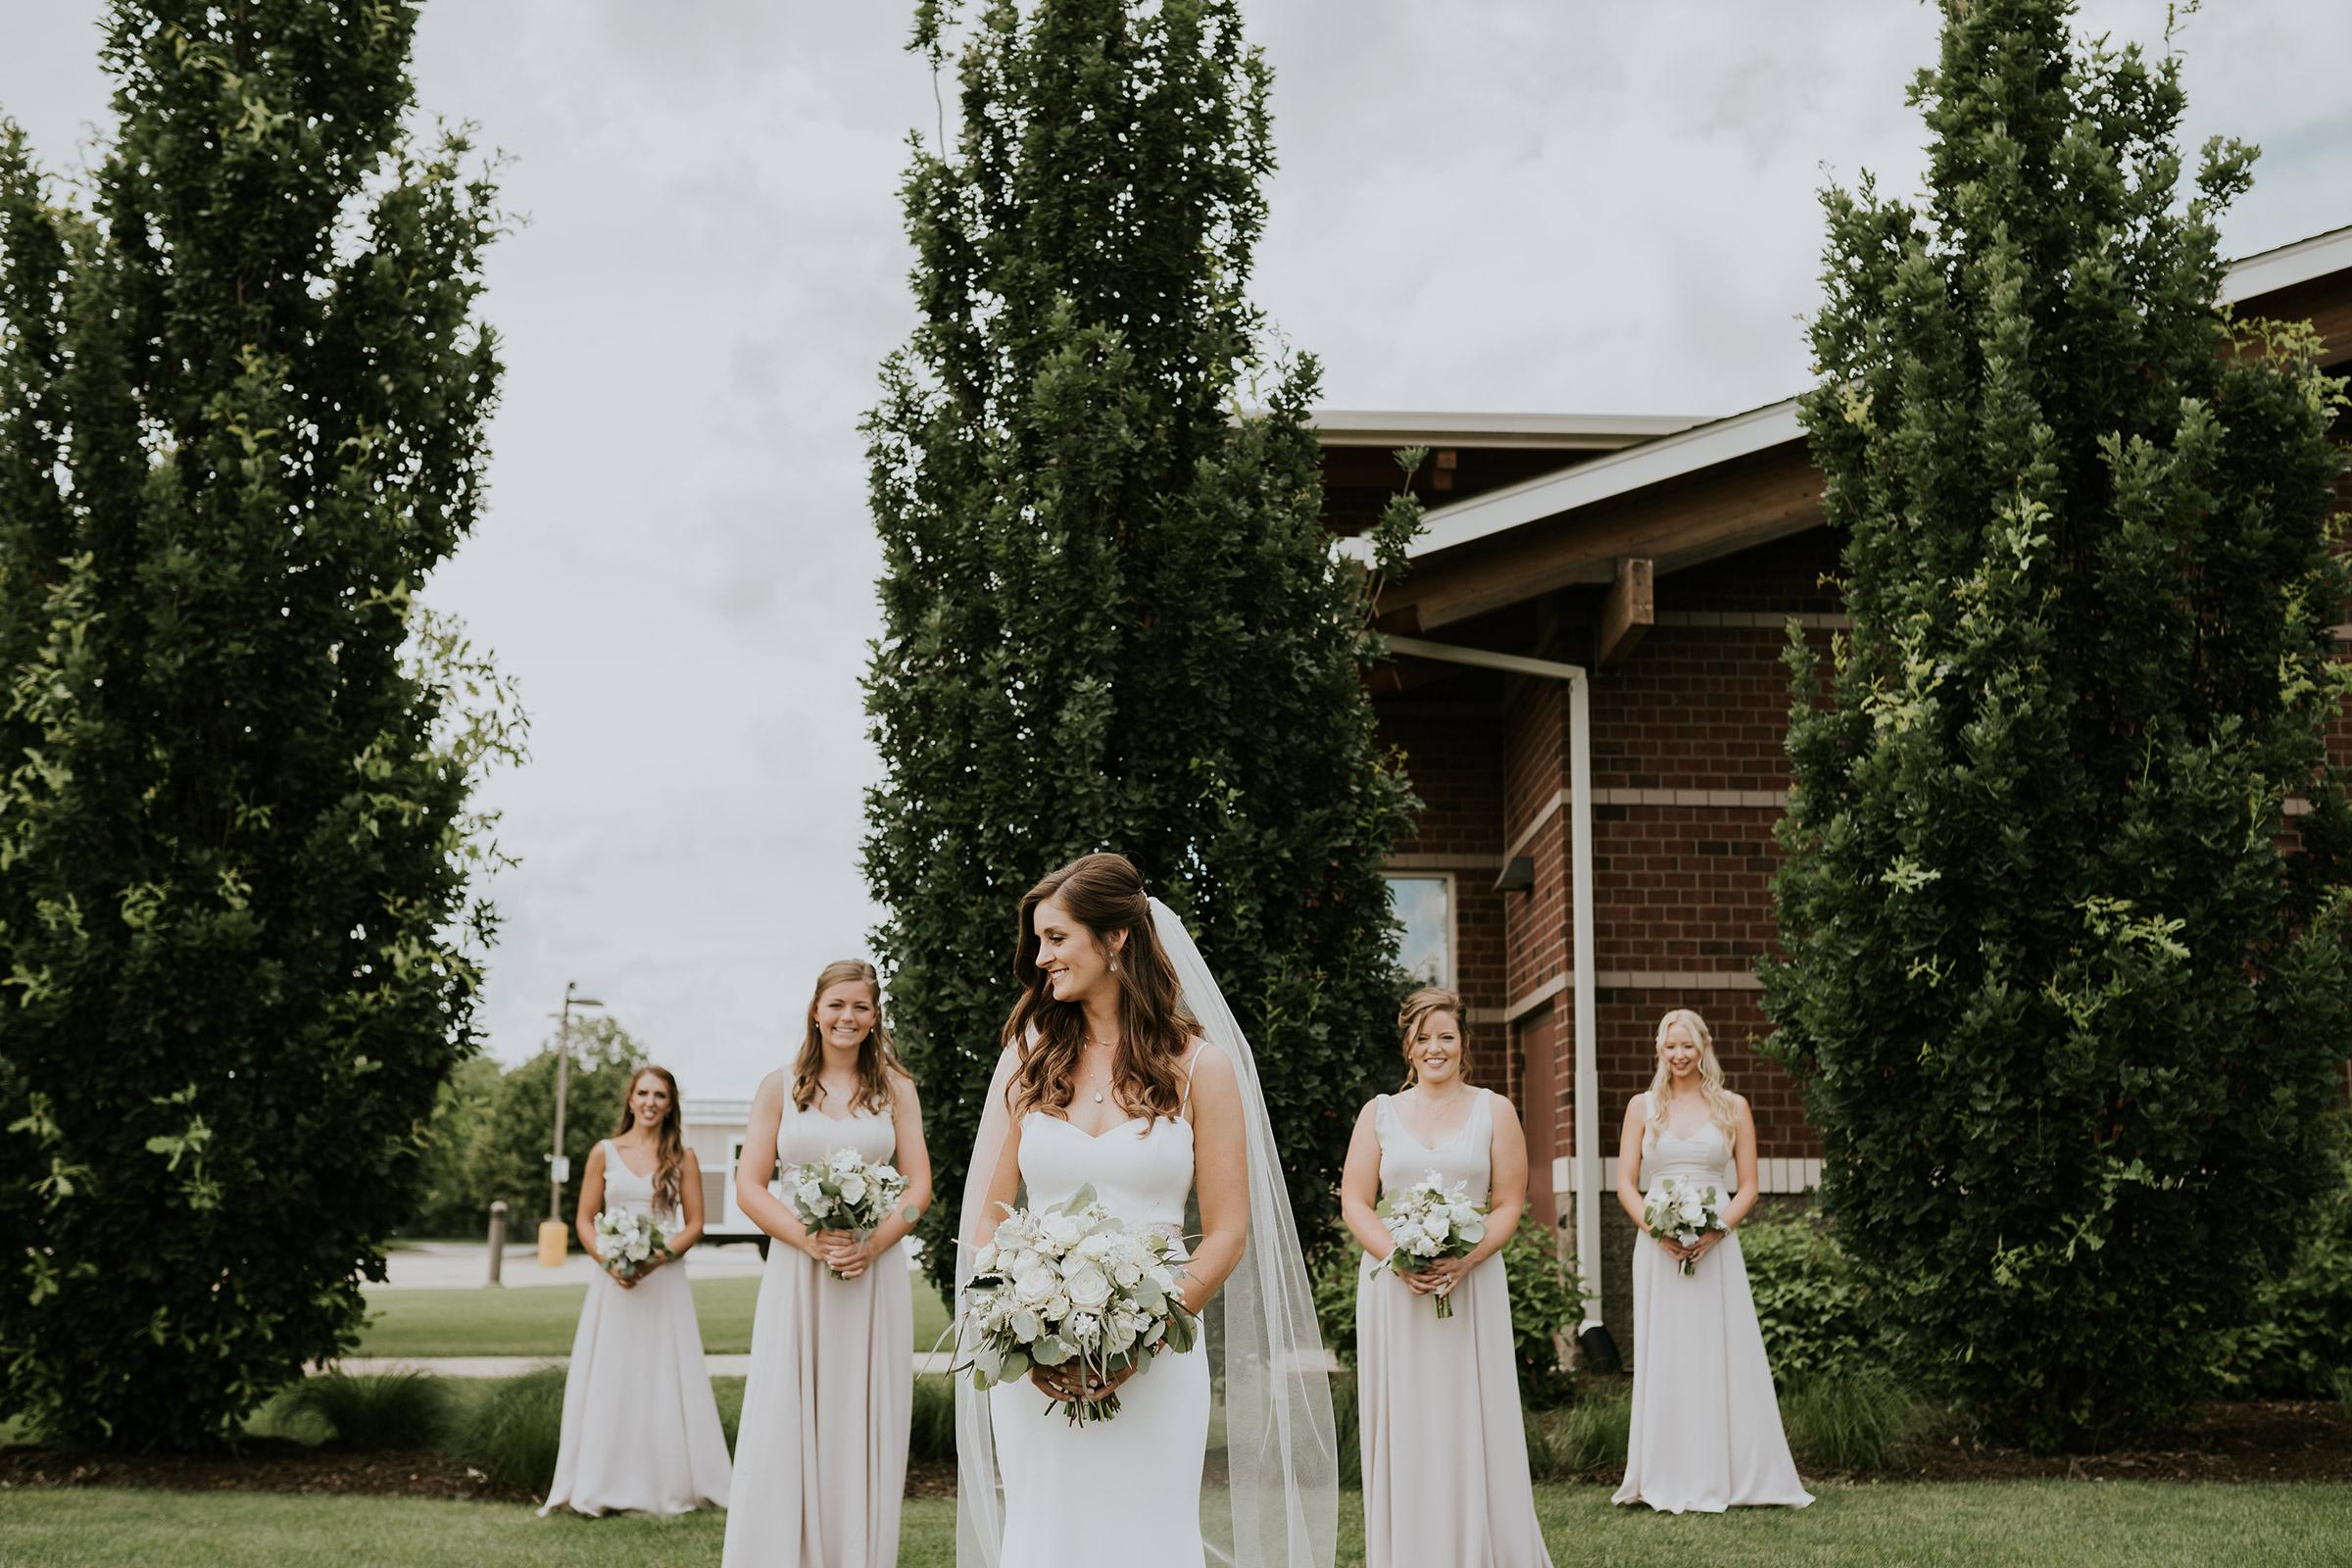 mr-mrs-hull-bride-posing-with-bridesmaid-in-v-shape-desmoines-iowa-raelyn-ramey-photography-231.jpg